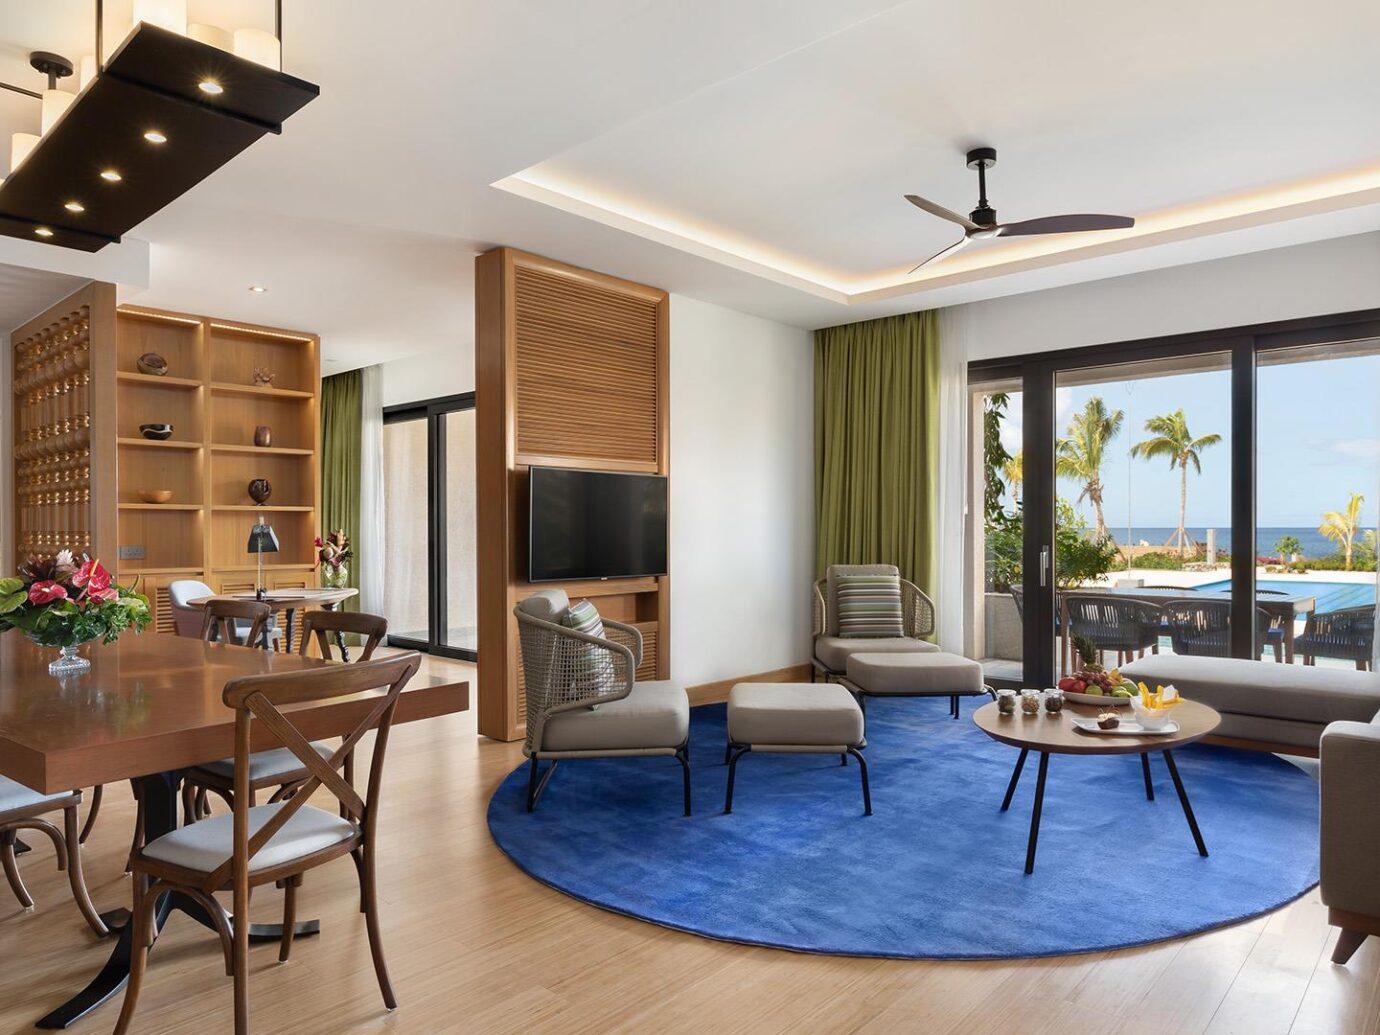 Living room at Cabrits Resort & Spa Kempinski